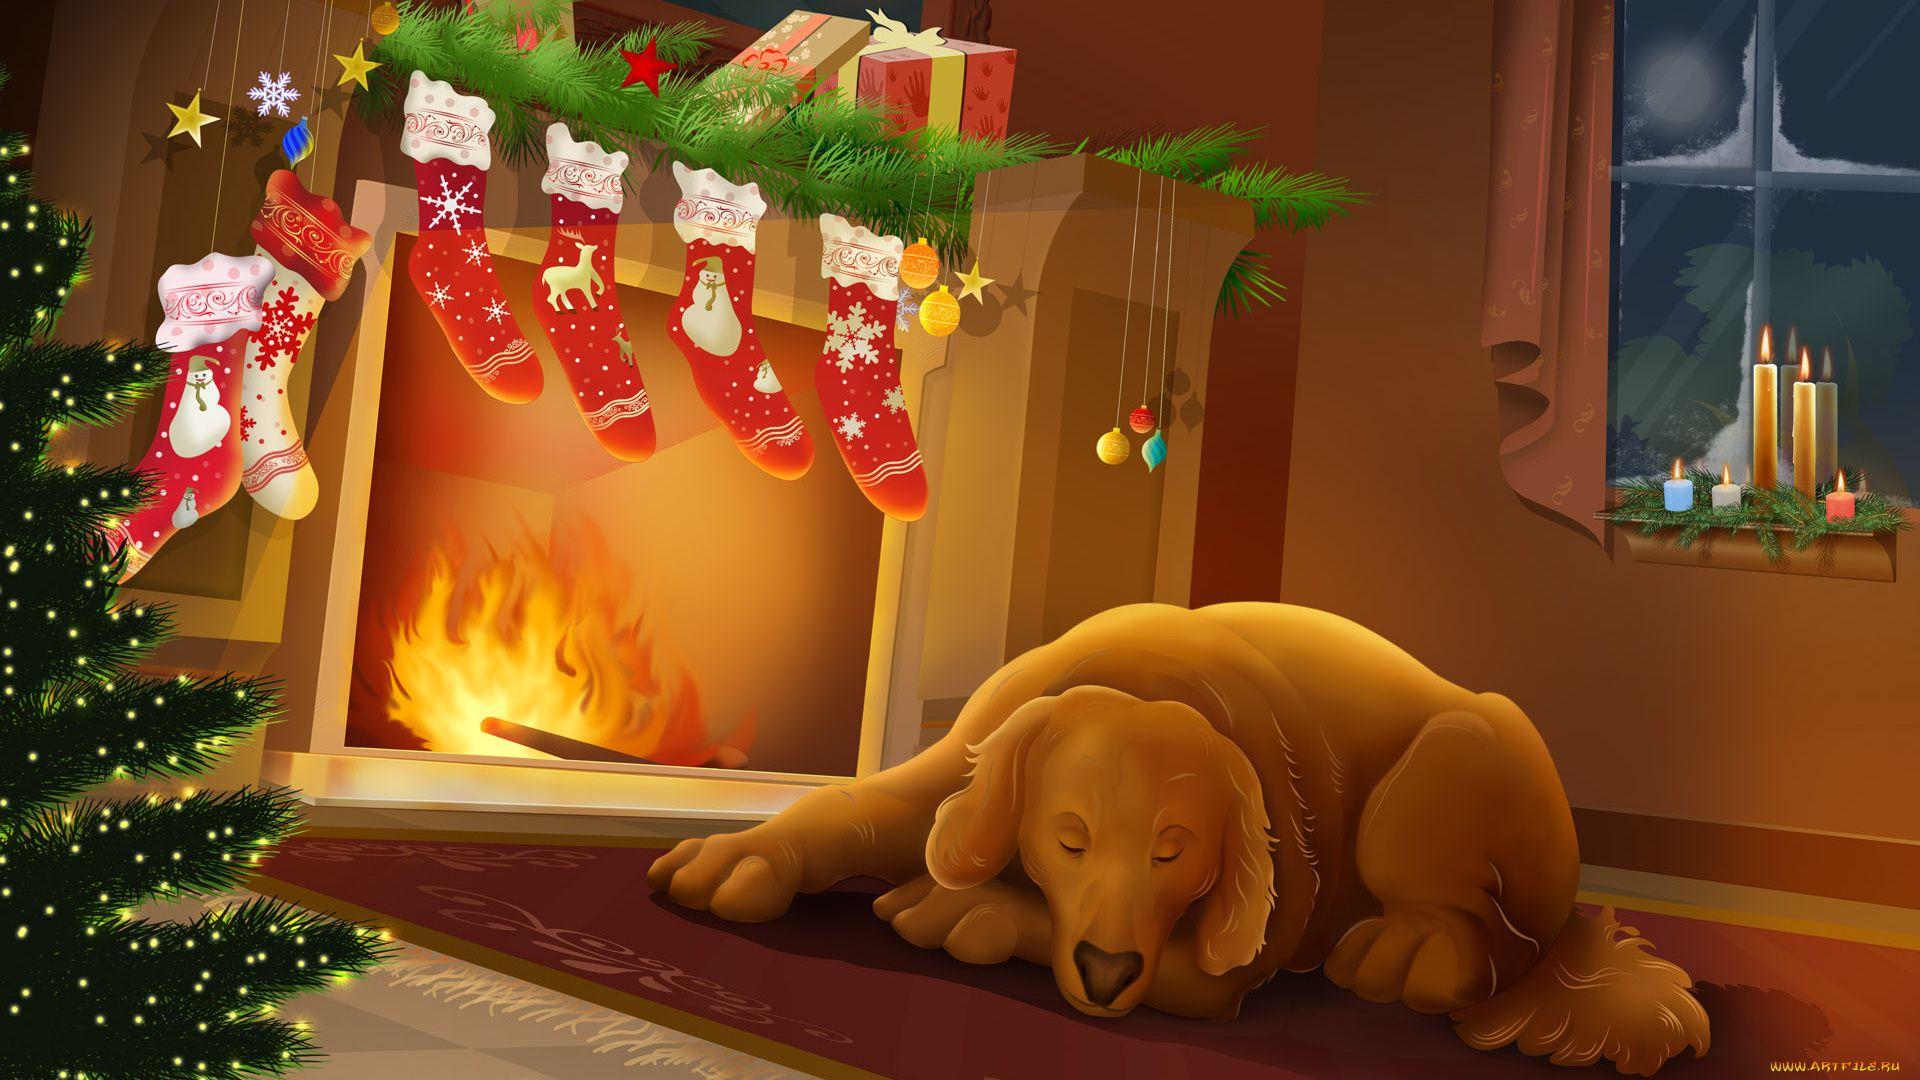 Christmas Fireplace Comfort good wallpaper hd